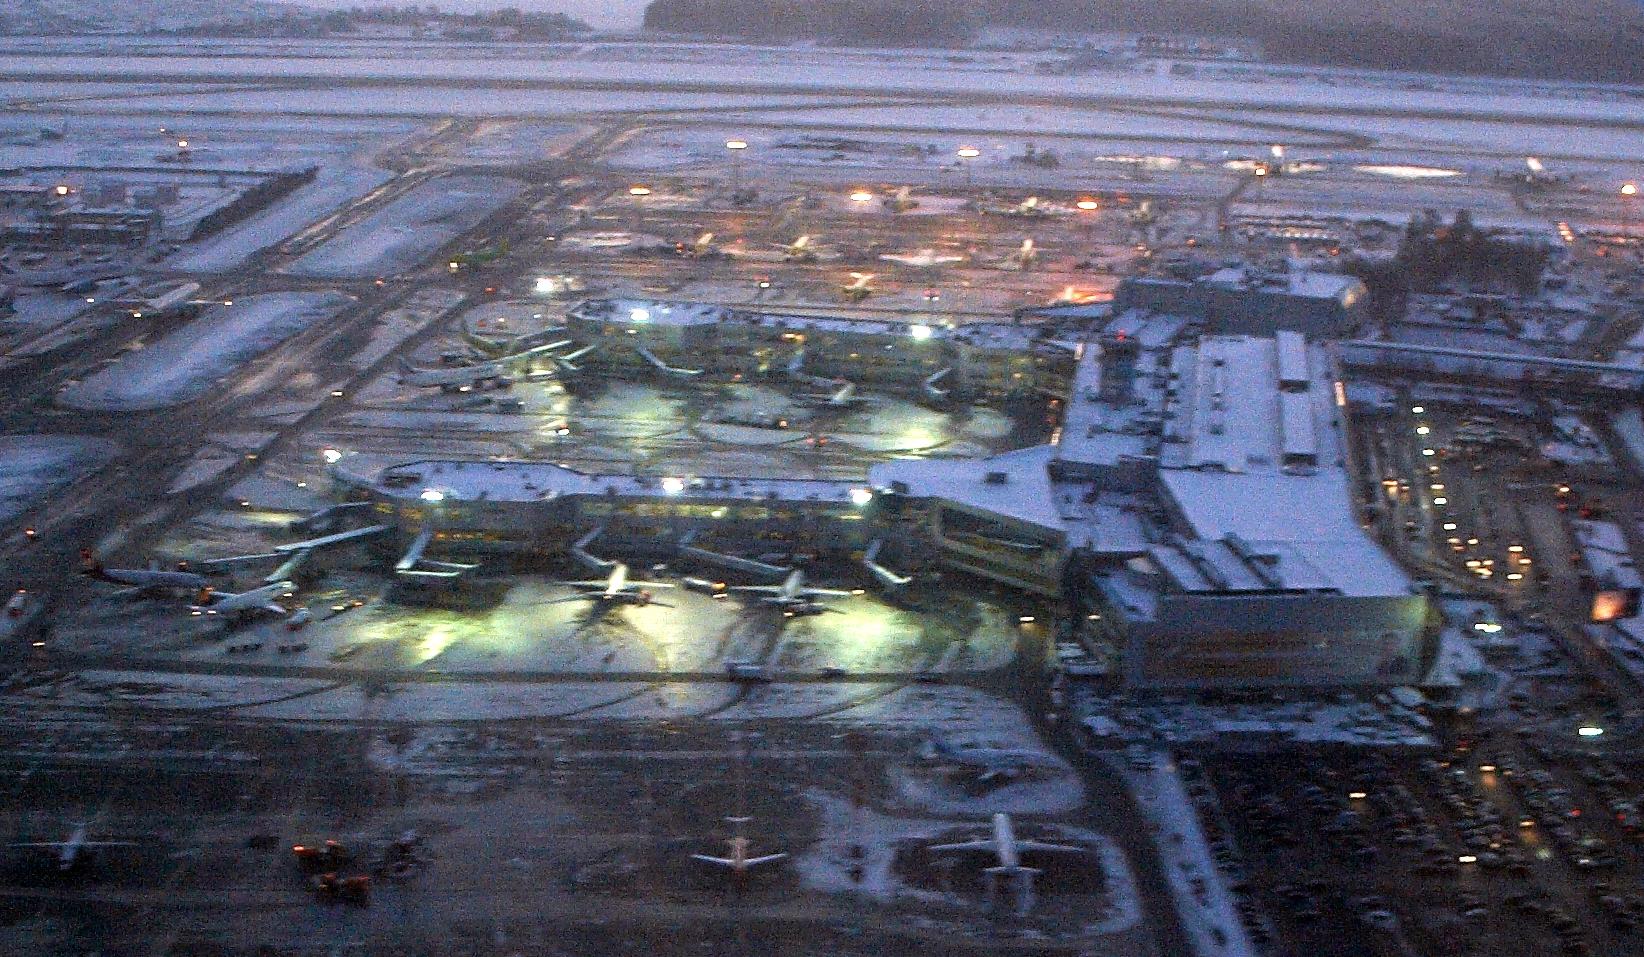 http://upload.wikimedia.org/wikipedia/commons/9/90/Domodedovo_Airport.jpg?uselang=ru